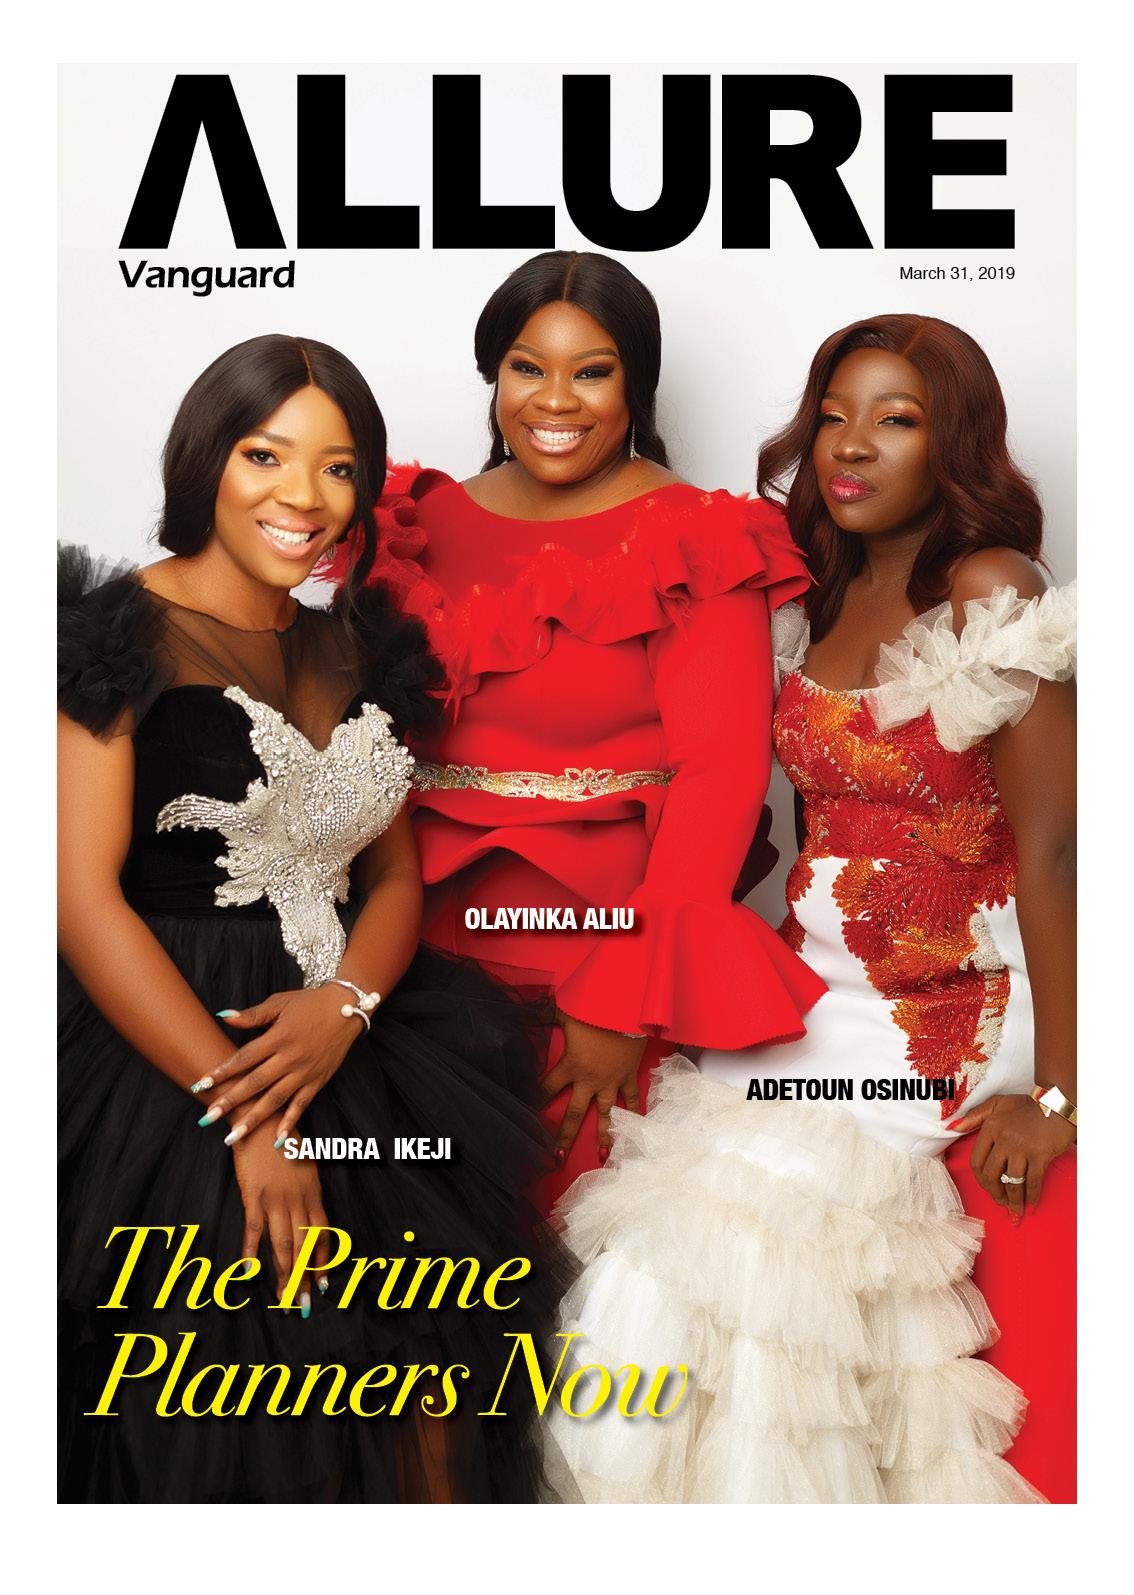 Meet the 'Prime Planners Now' featured on Vanguard Allure's Latest Cover – Sandra Ikeji, Yinka Aliu & Adetoun Osinubi